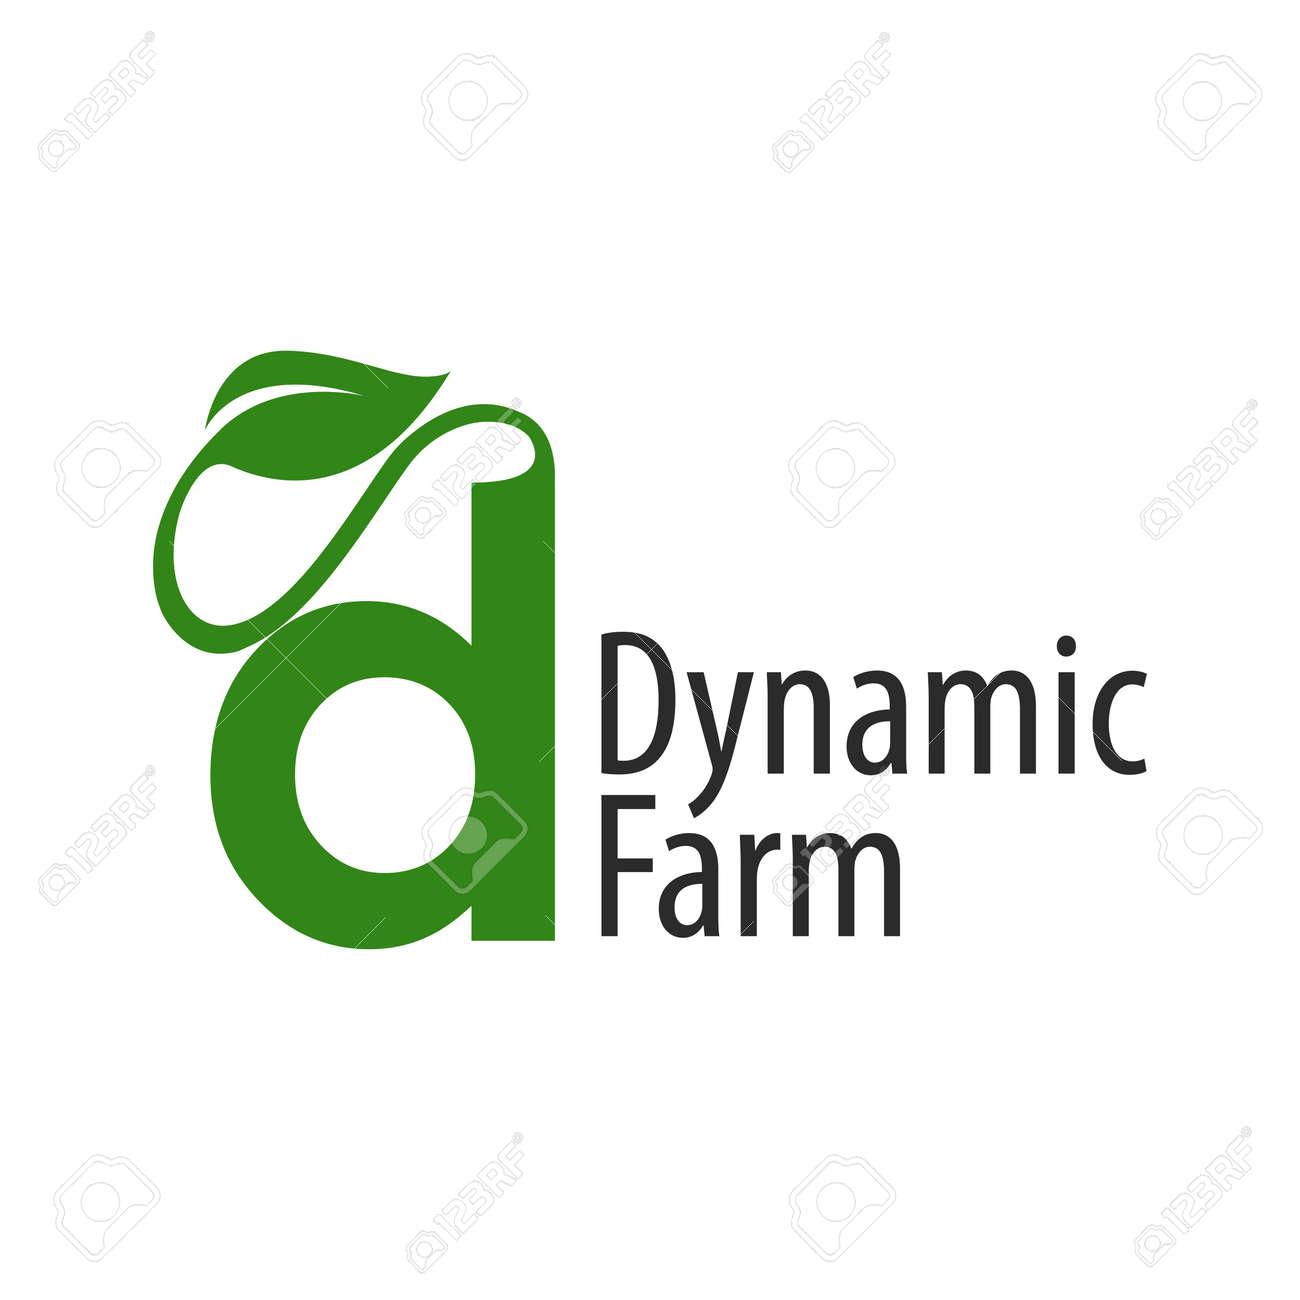 Dynamic farm initial letter d with leaf logo concept design template idea - 143647203